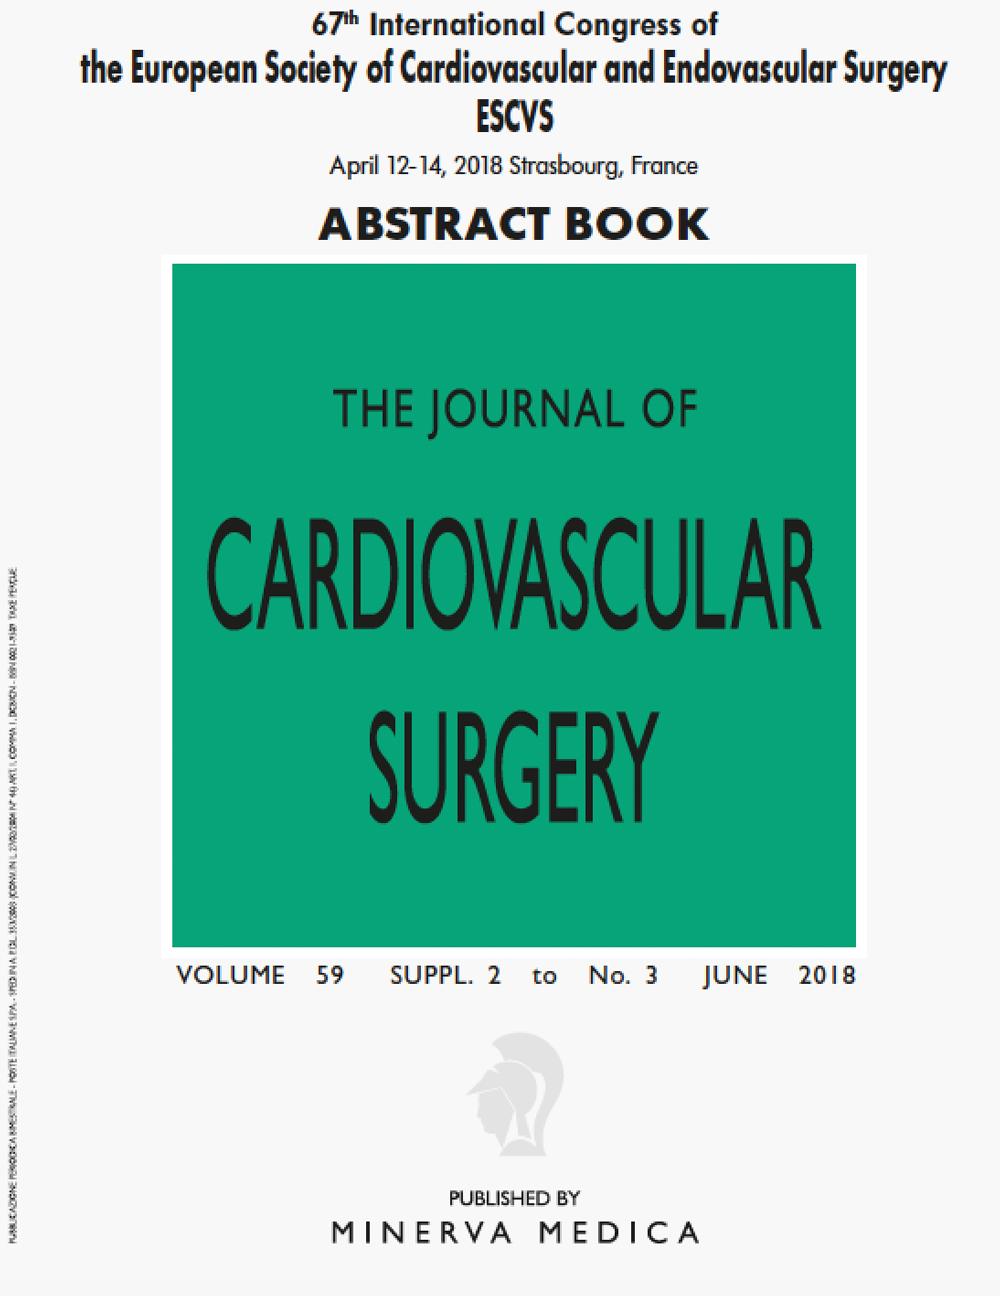 67th International Congress Of The European Society Of Cardiovascular And Endovascular Surgery ESCVS